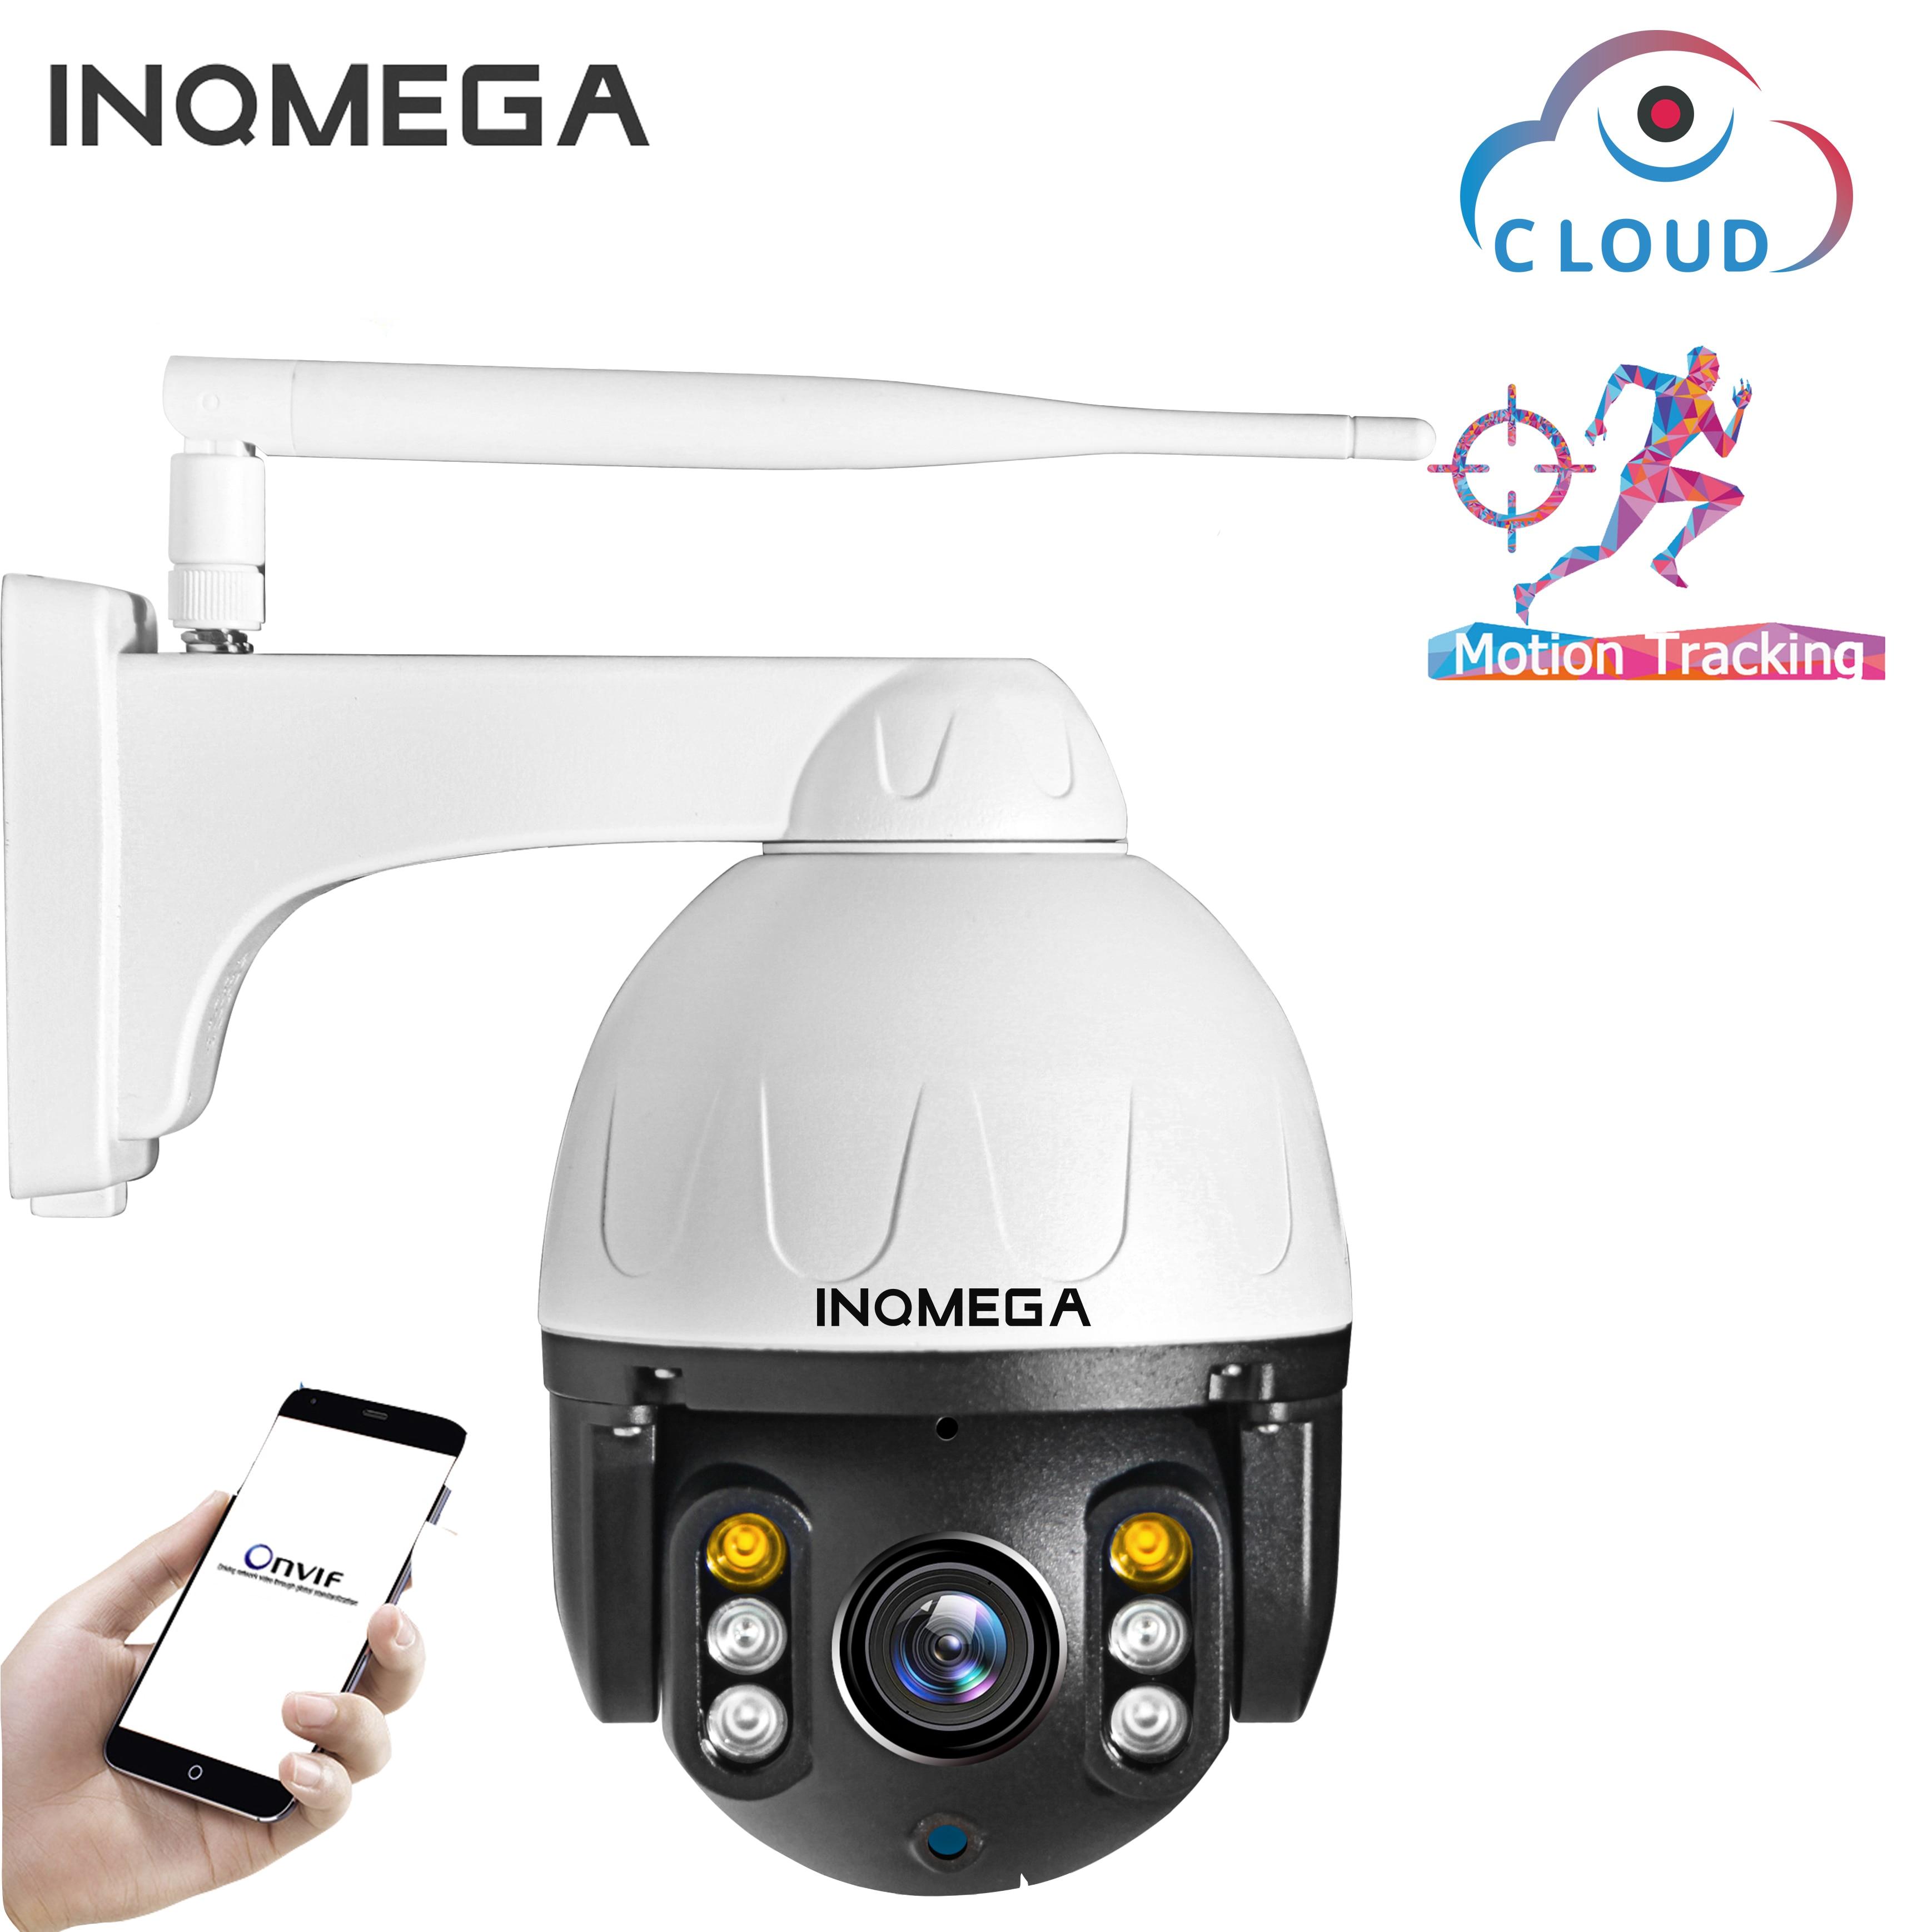 INQMEGA Cloud 1080P Outdoor PTZ IP Camera WIFI Speed Dome Auto Tracking Camera 4X Digital Zoom